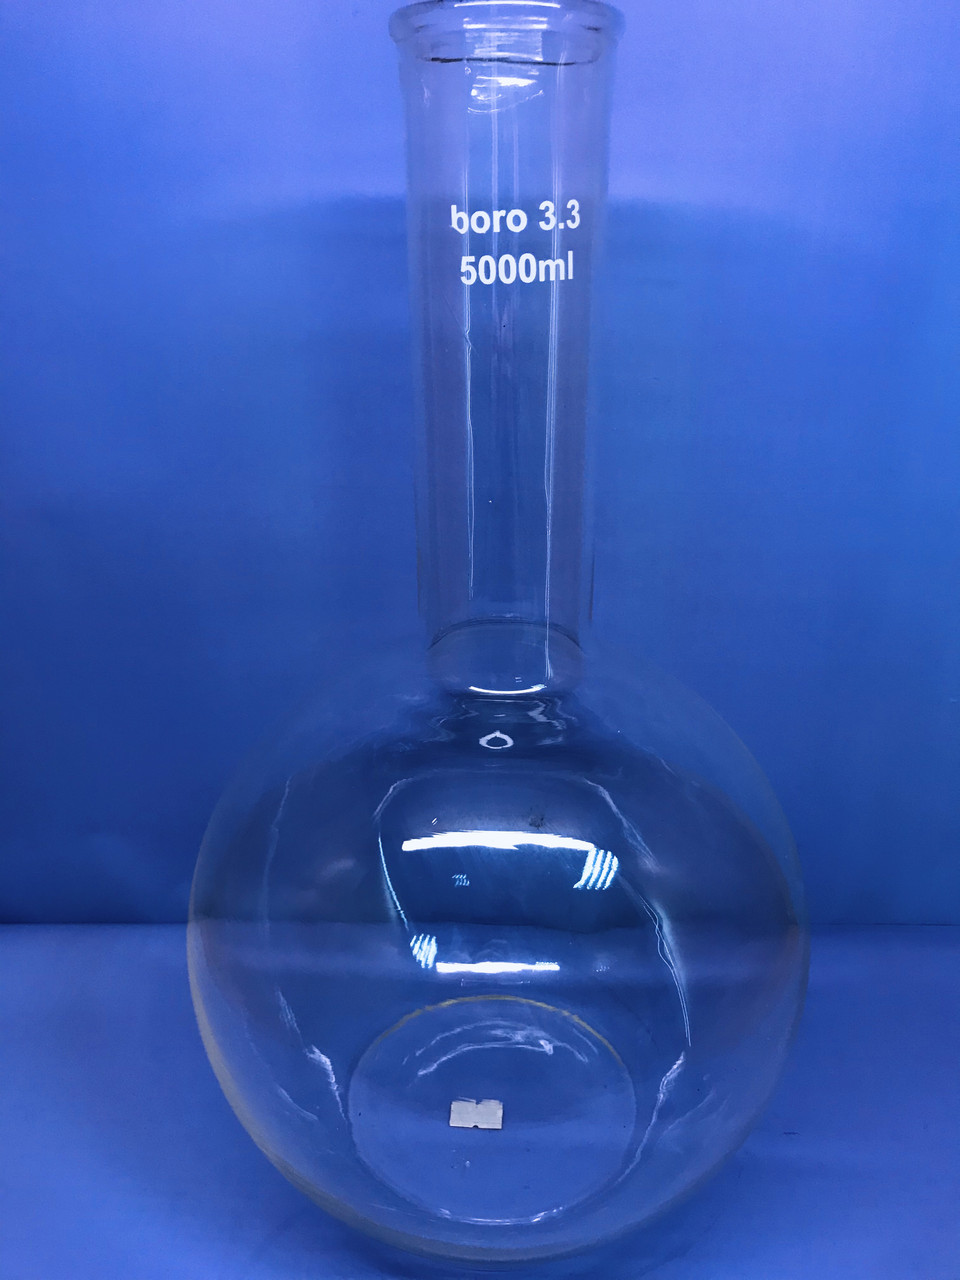 Колба плоскодонная без шлифа 5000мл, д.50, Boro 3.3